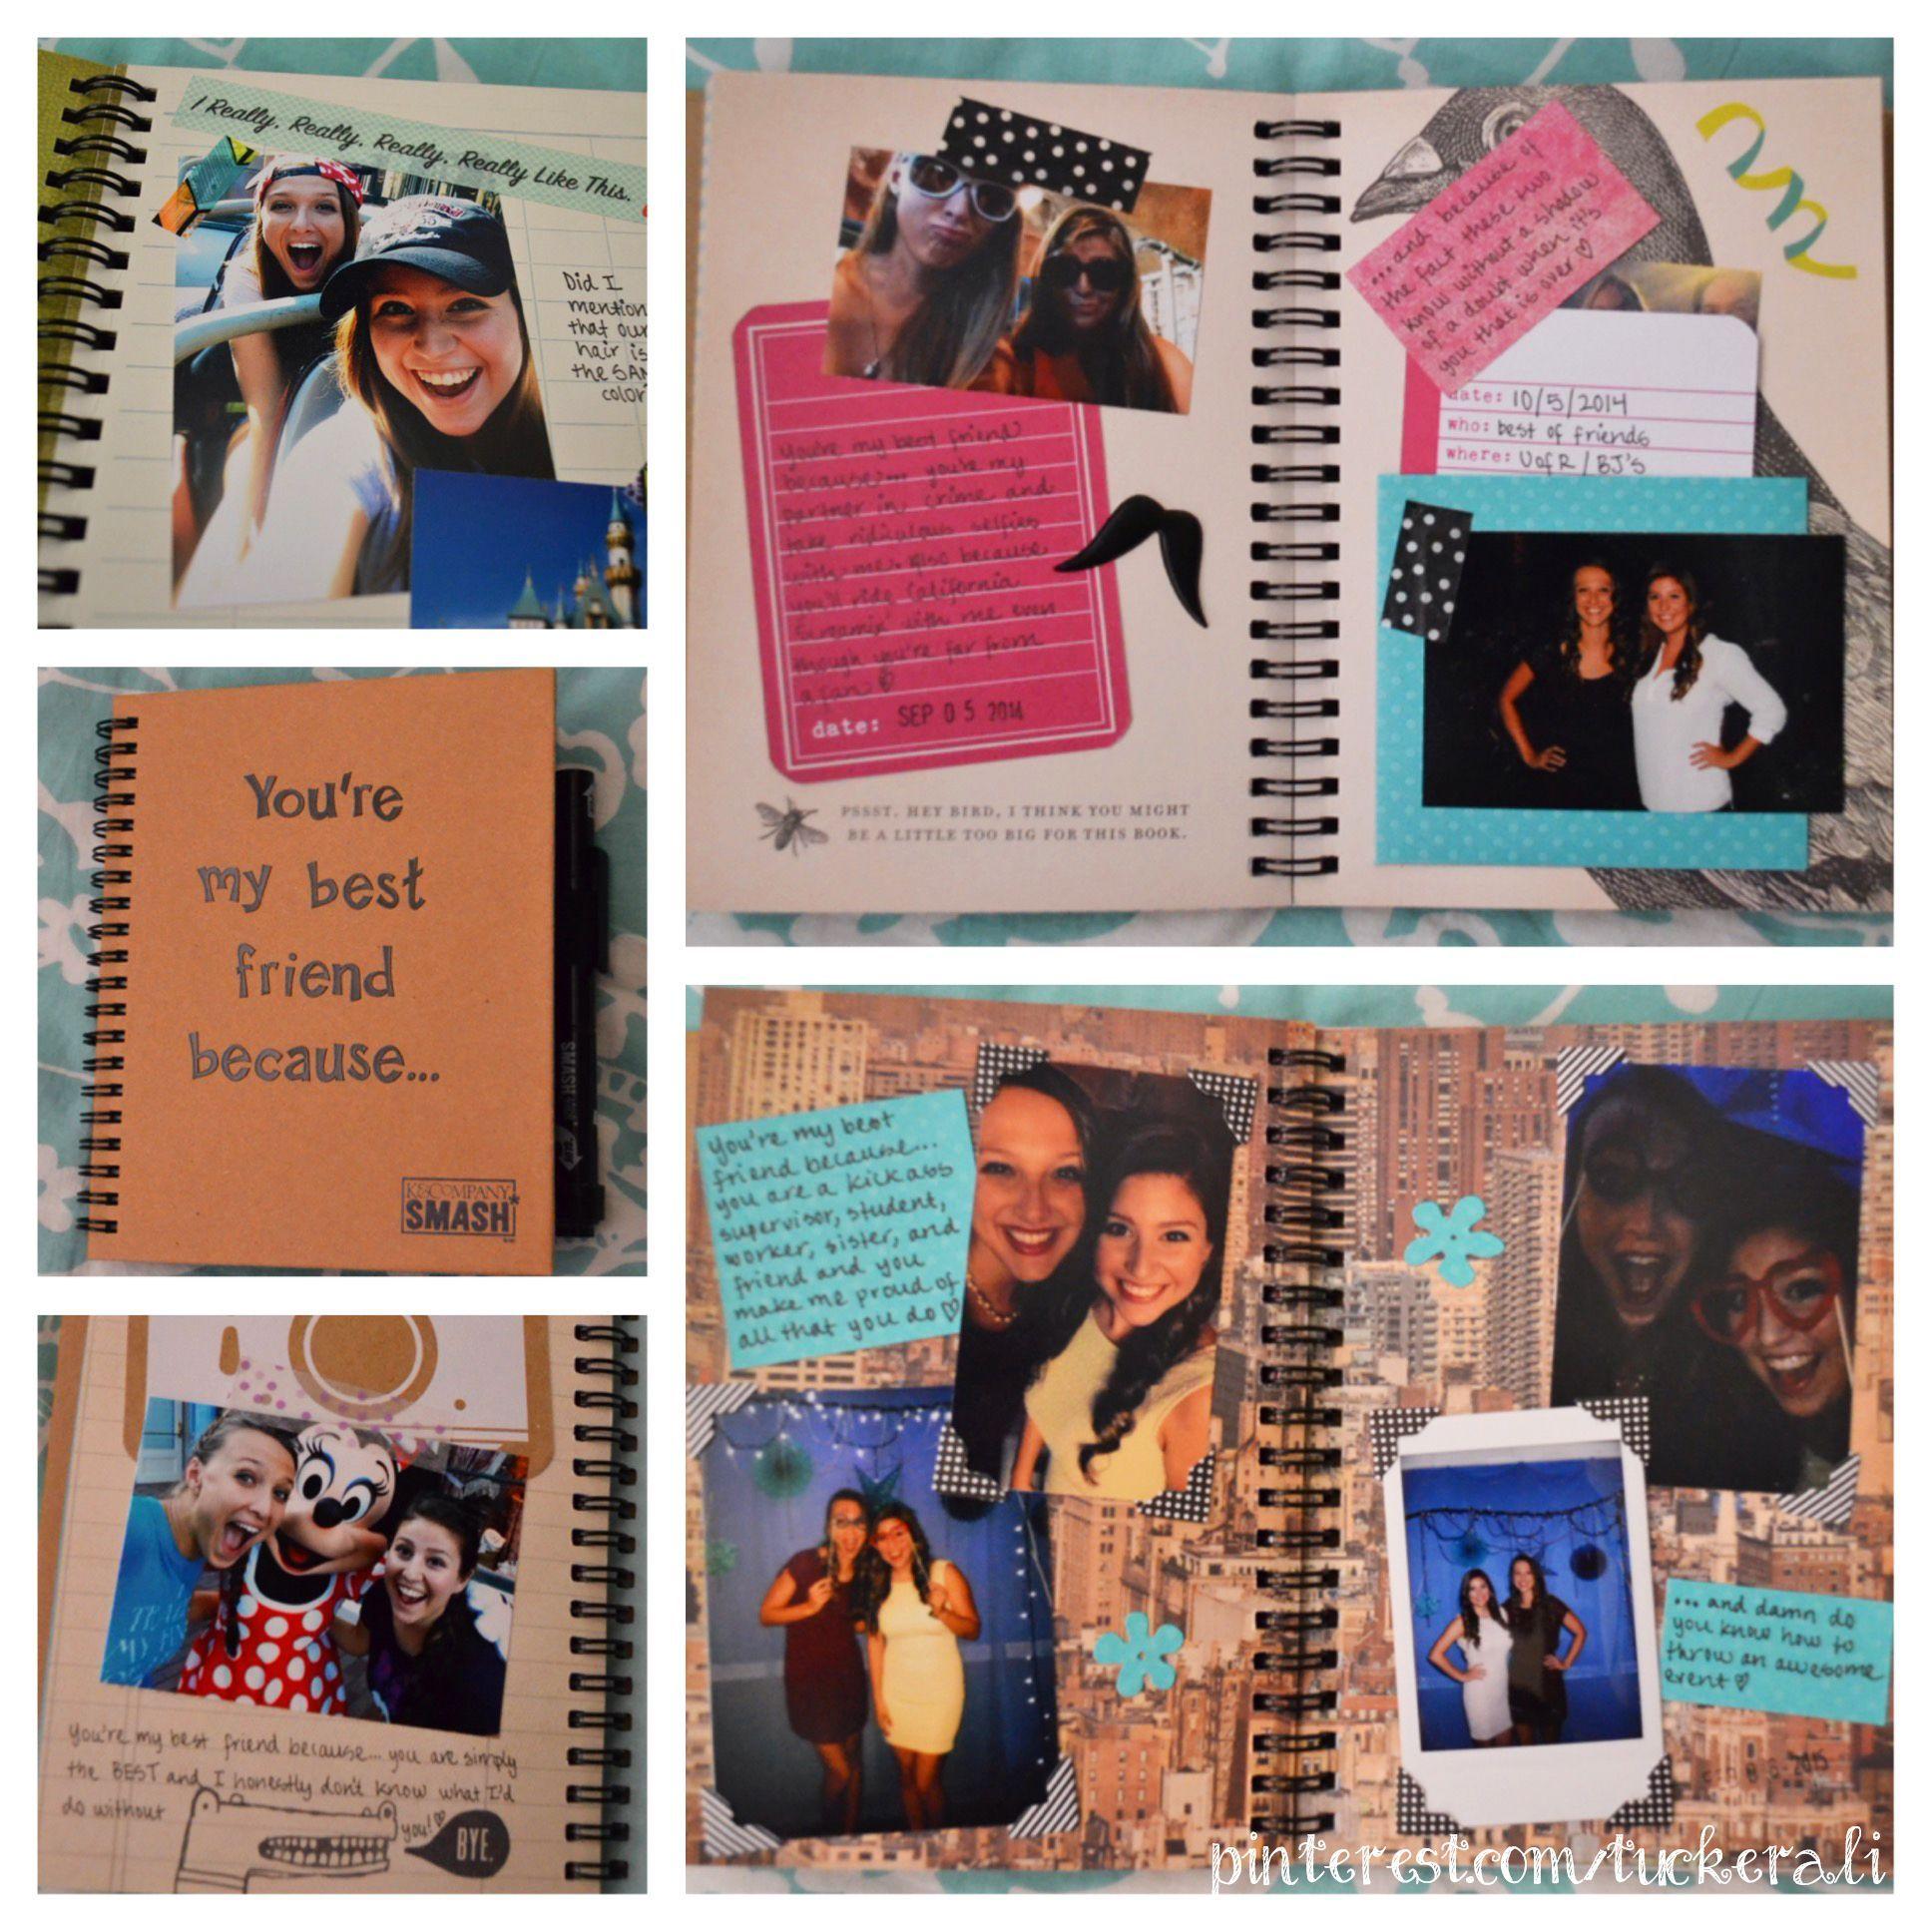 28 Great Picture Of Best Friend Scrapbook Ideas Best Friend Scrapbook Ideas Diy Best Friend Diy Best Friend Gifts Scrapbook For Best Friend Friend Scrapbook